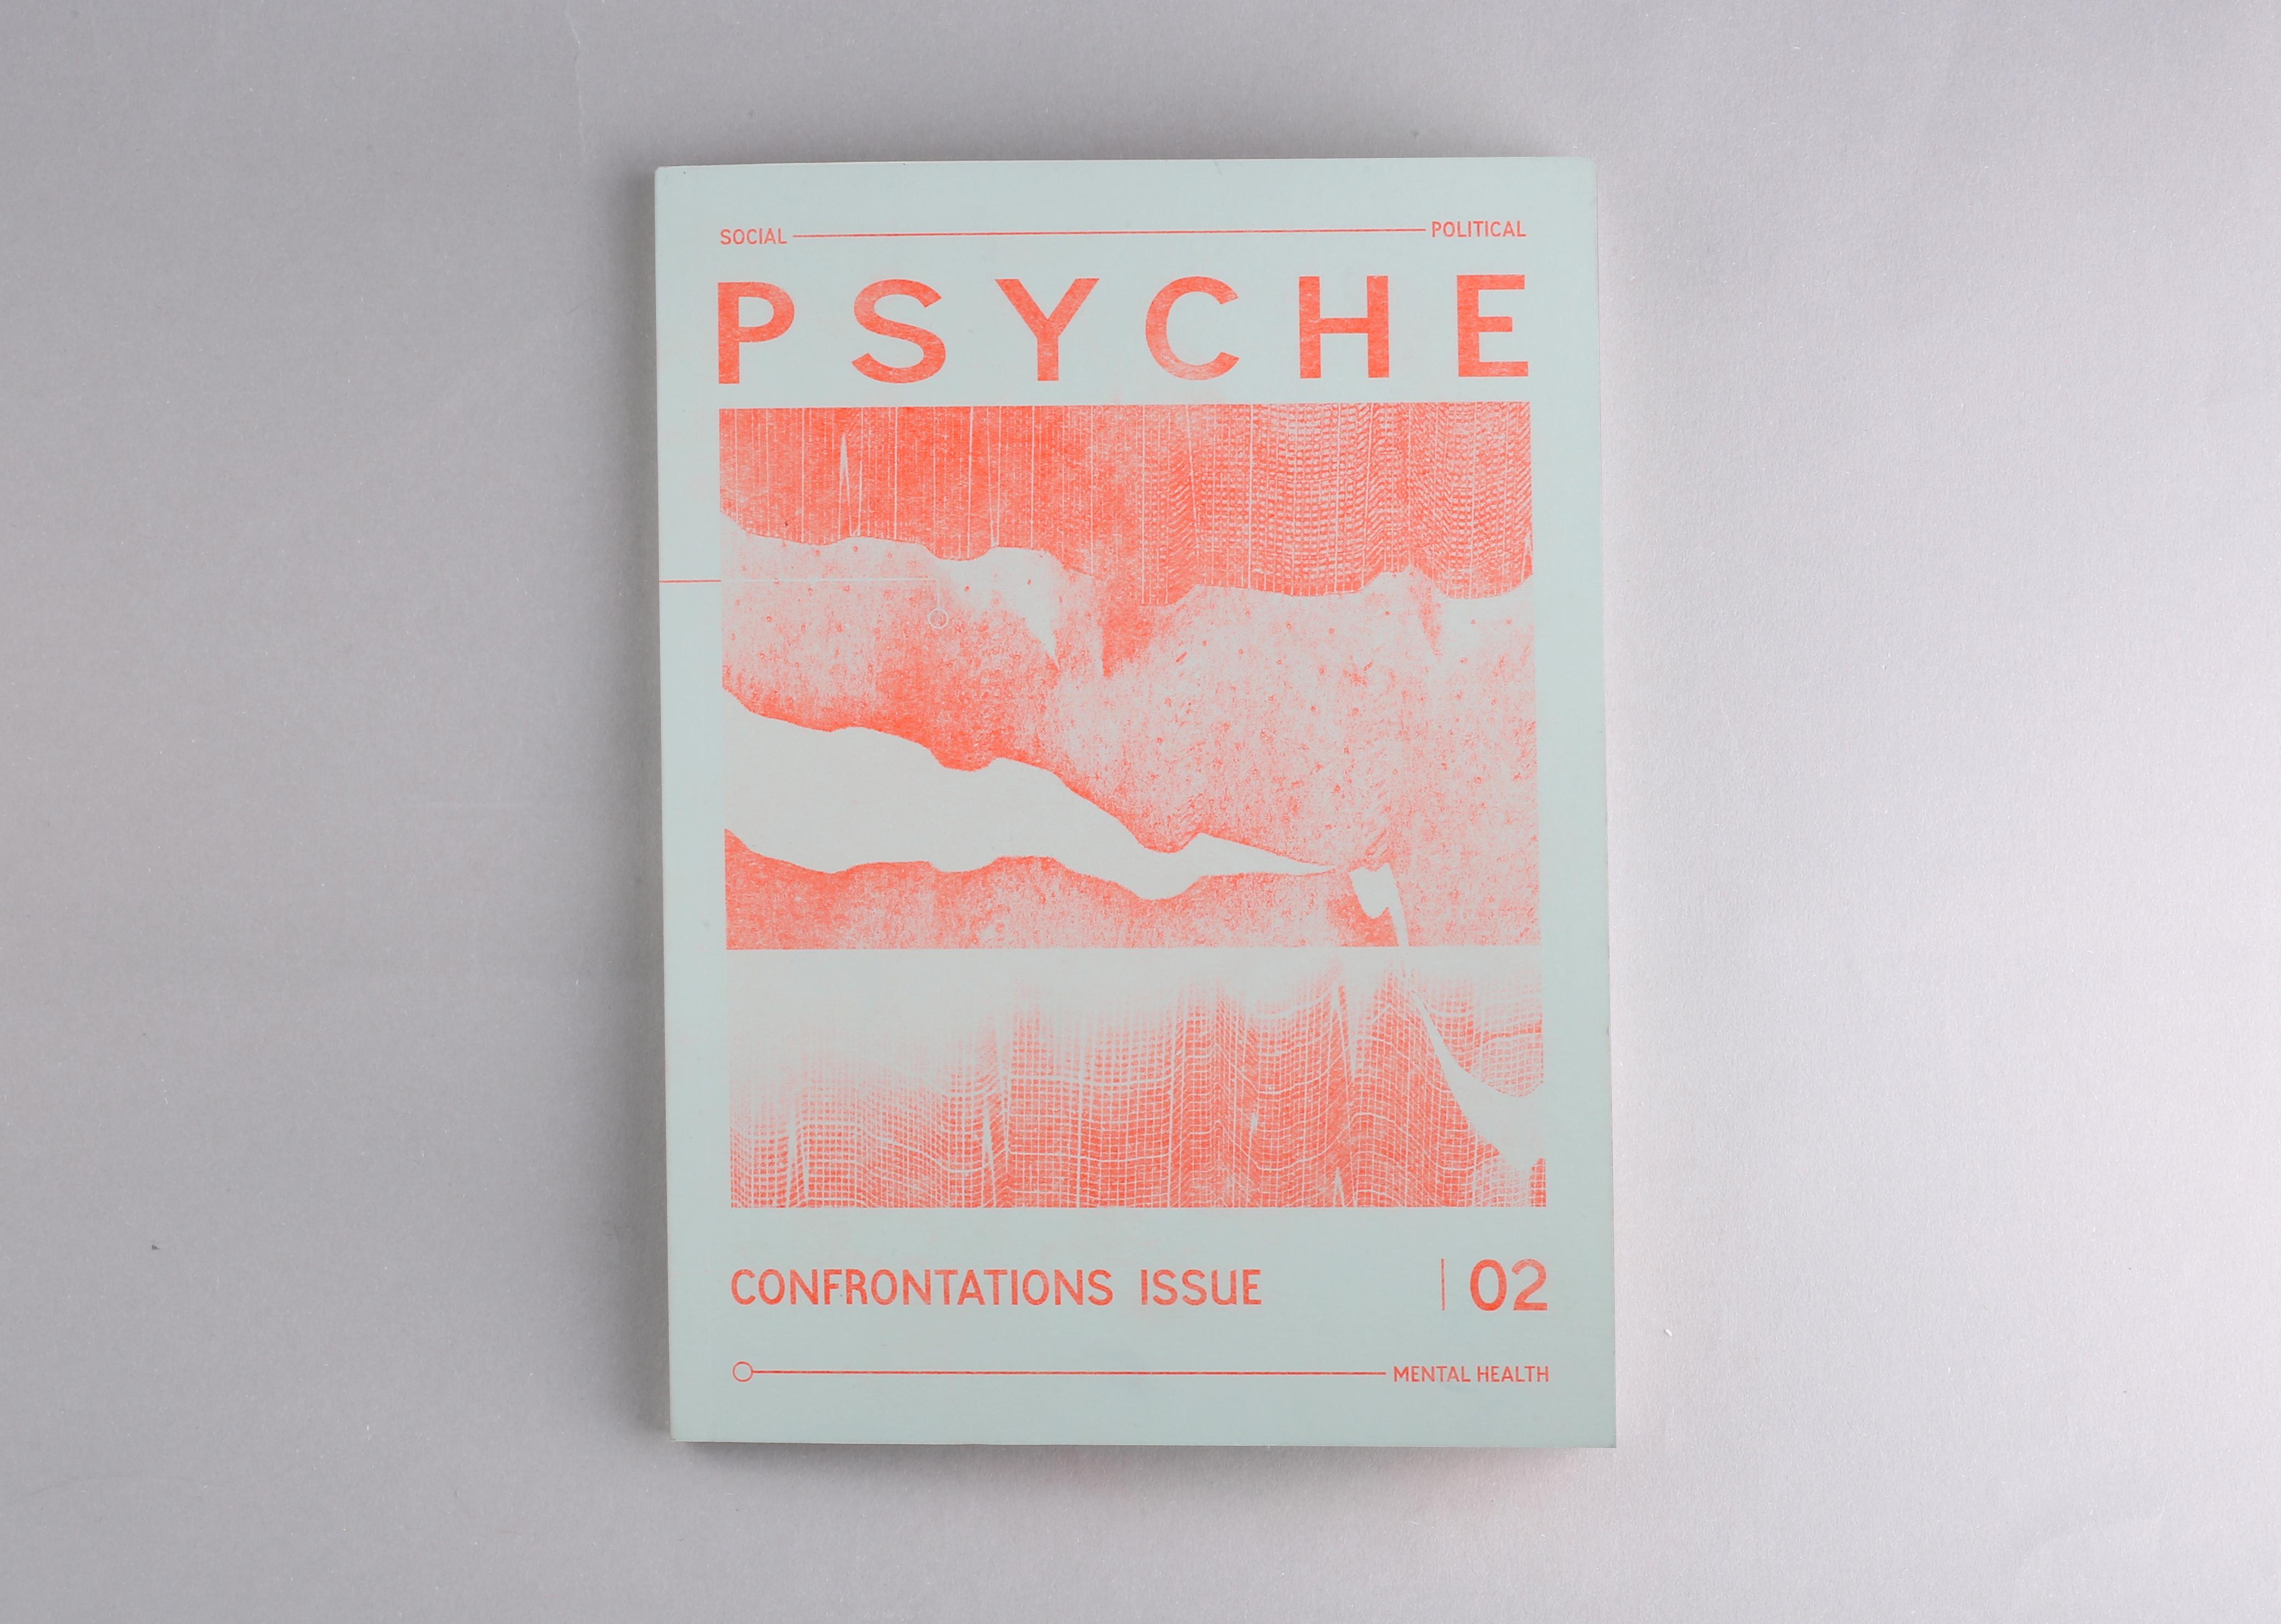 Interview: Psyche Publication